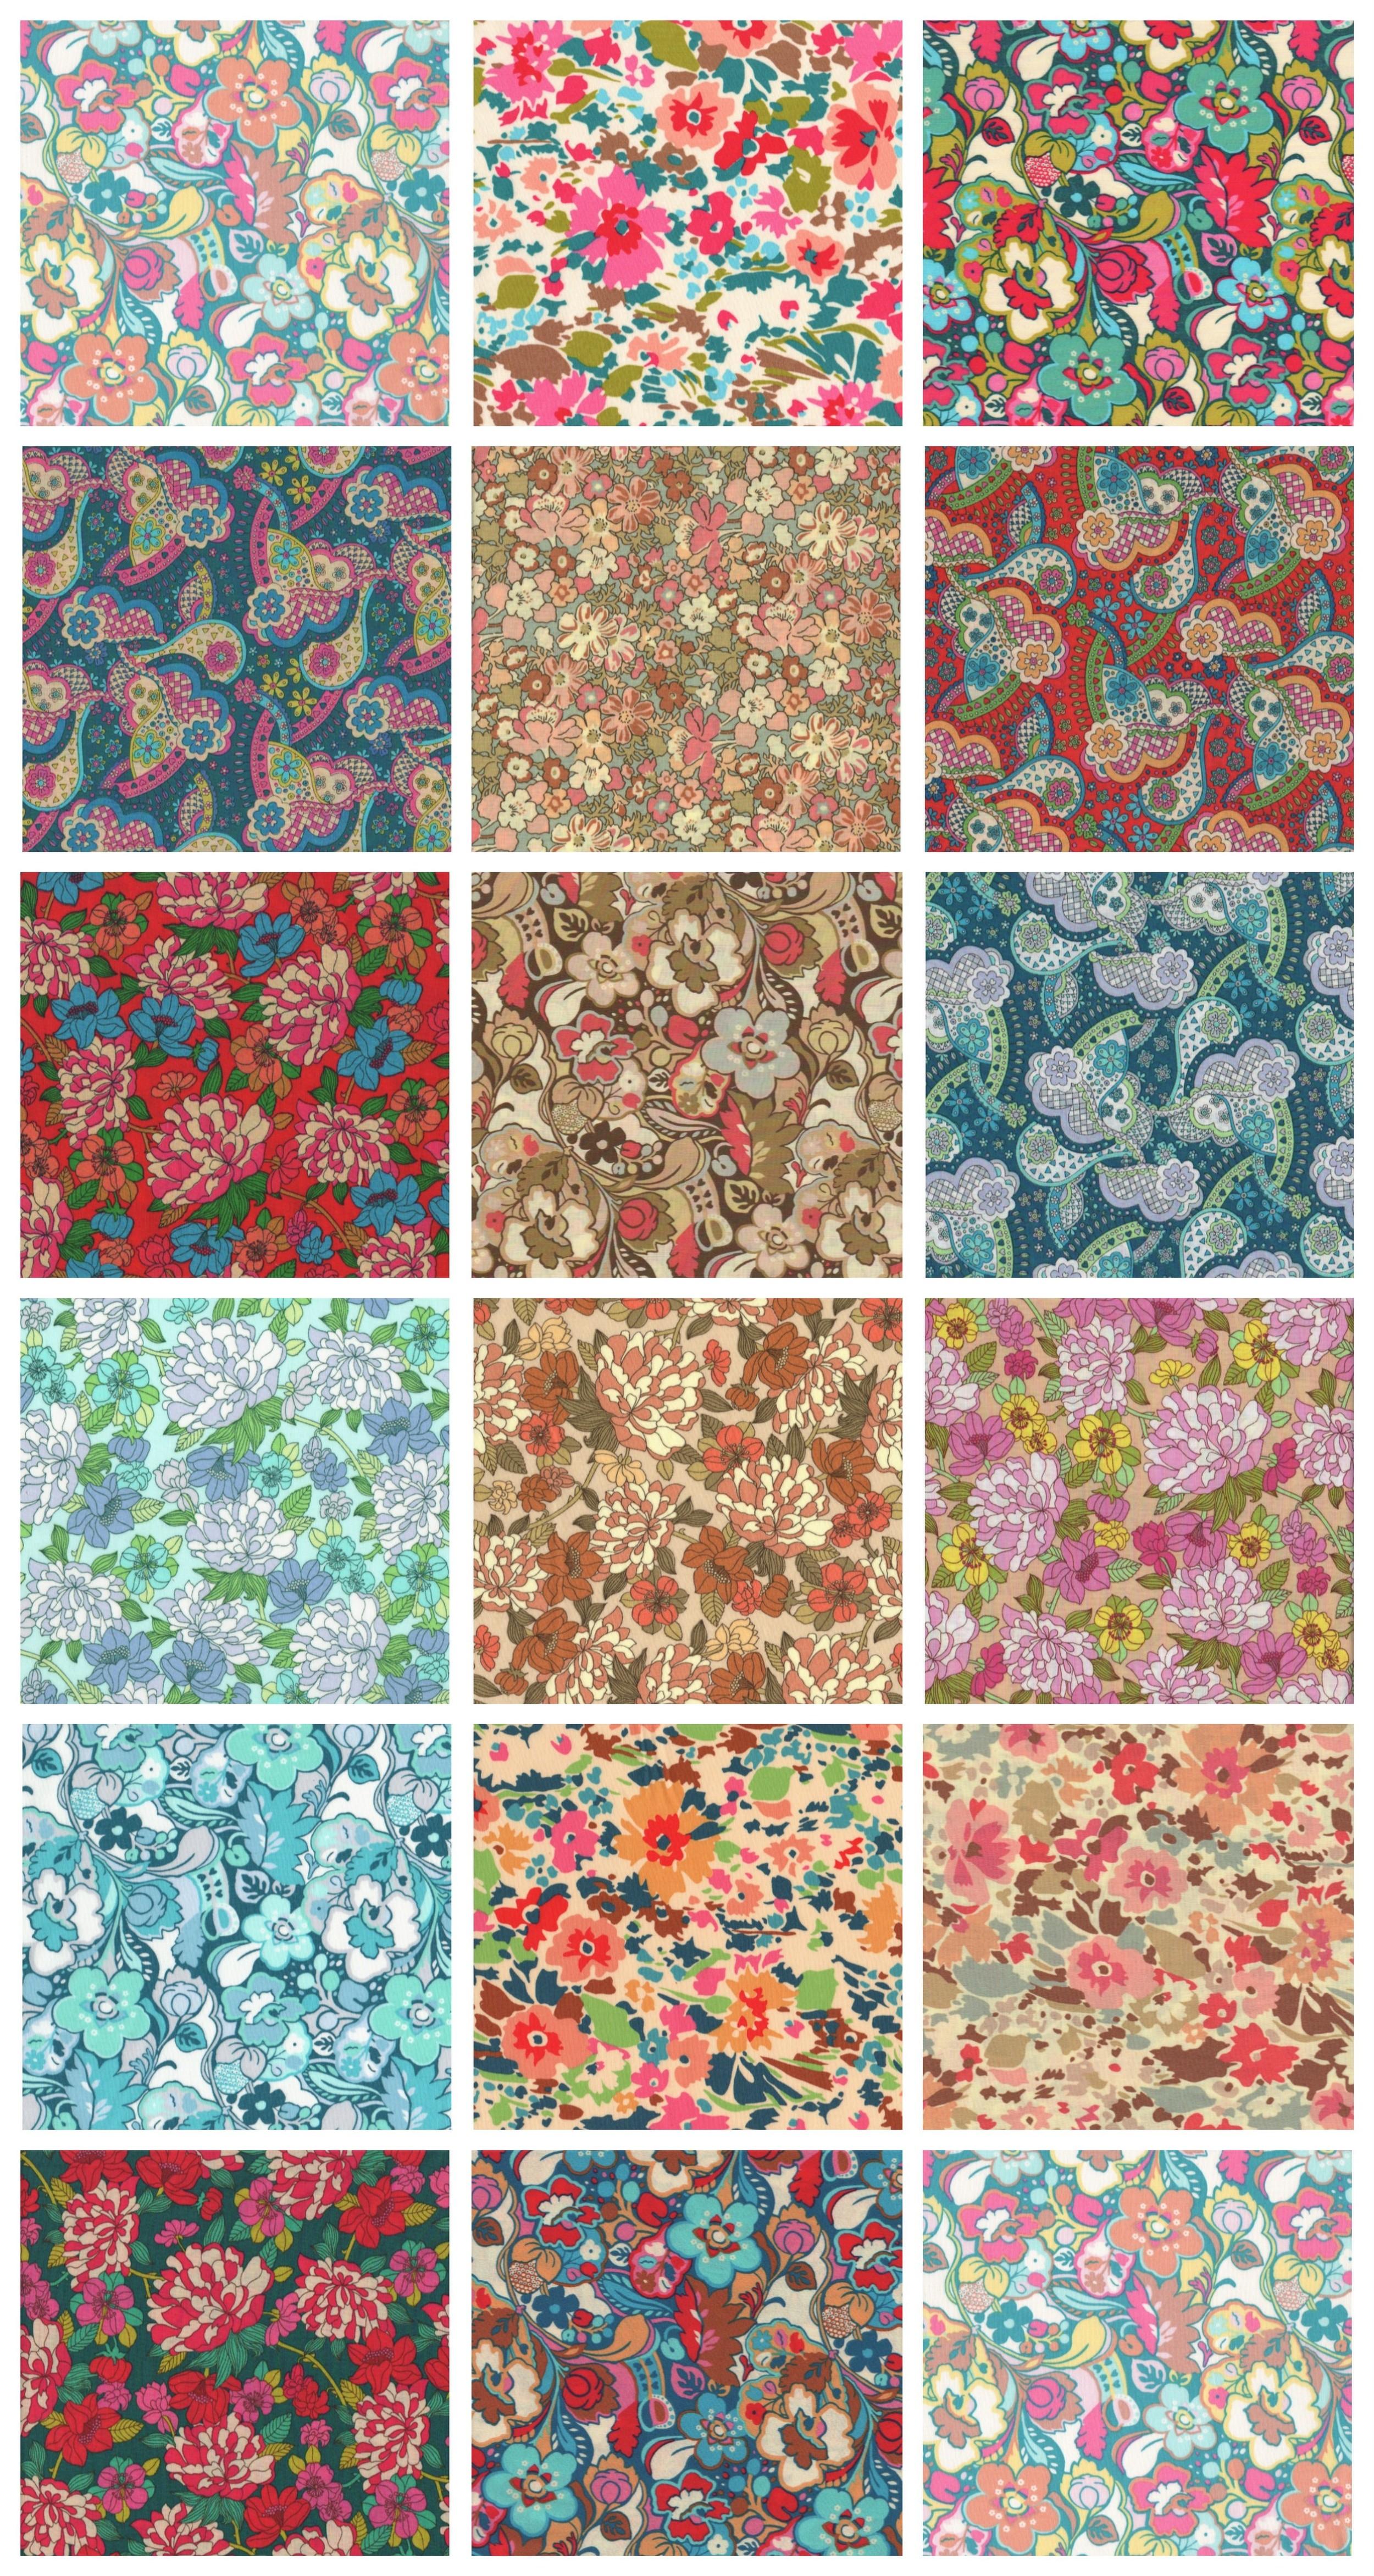 Liberty Lifestyle Fabric at CityCraft http://citycraftonline.com